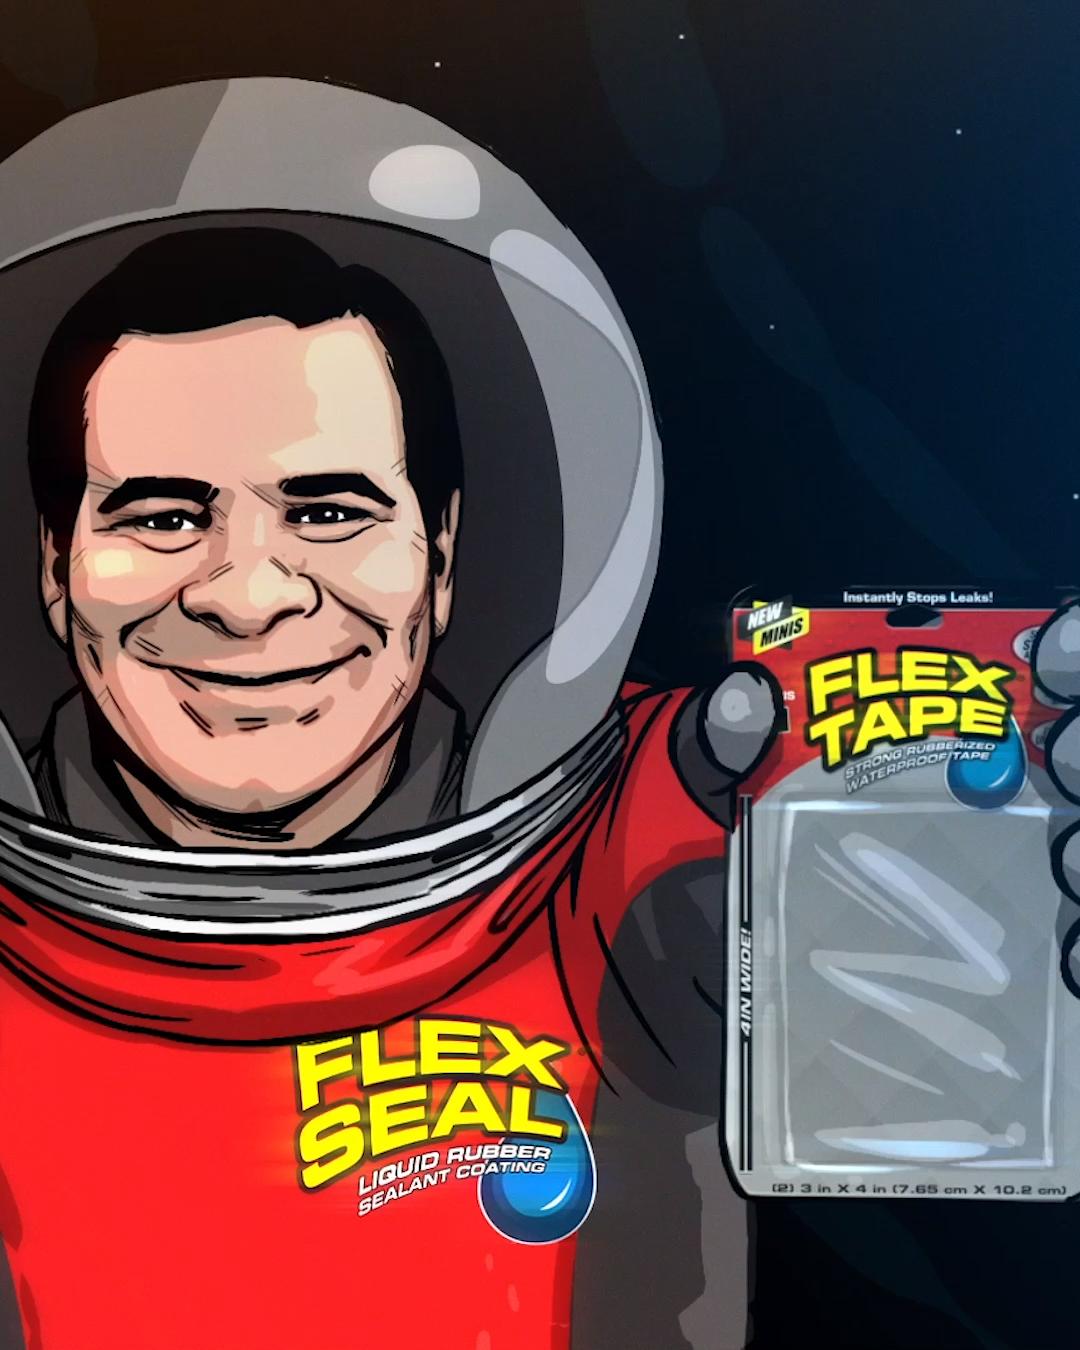 Phil Swift Flex Tape Astronauts Space Video Phil Swift Phil Skeletor